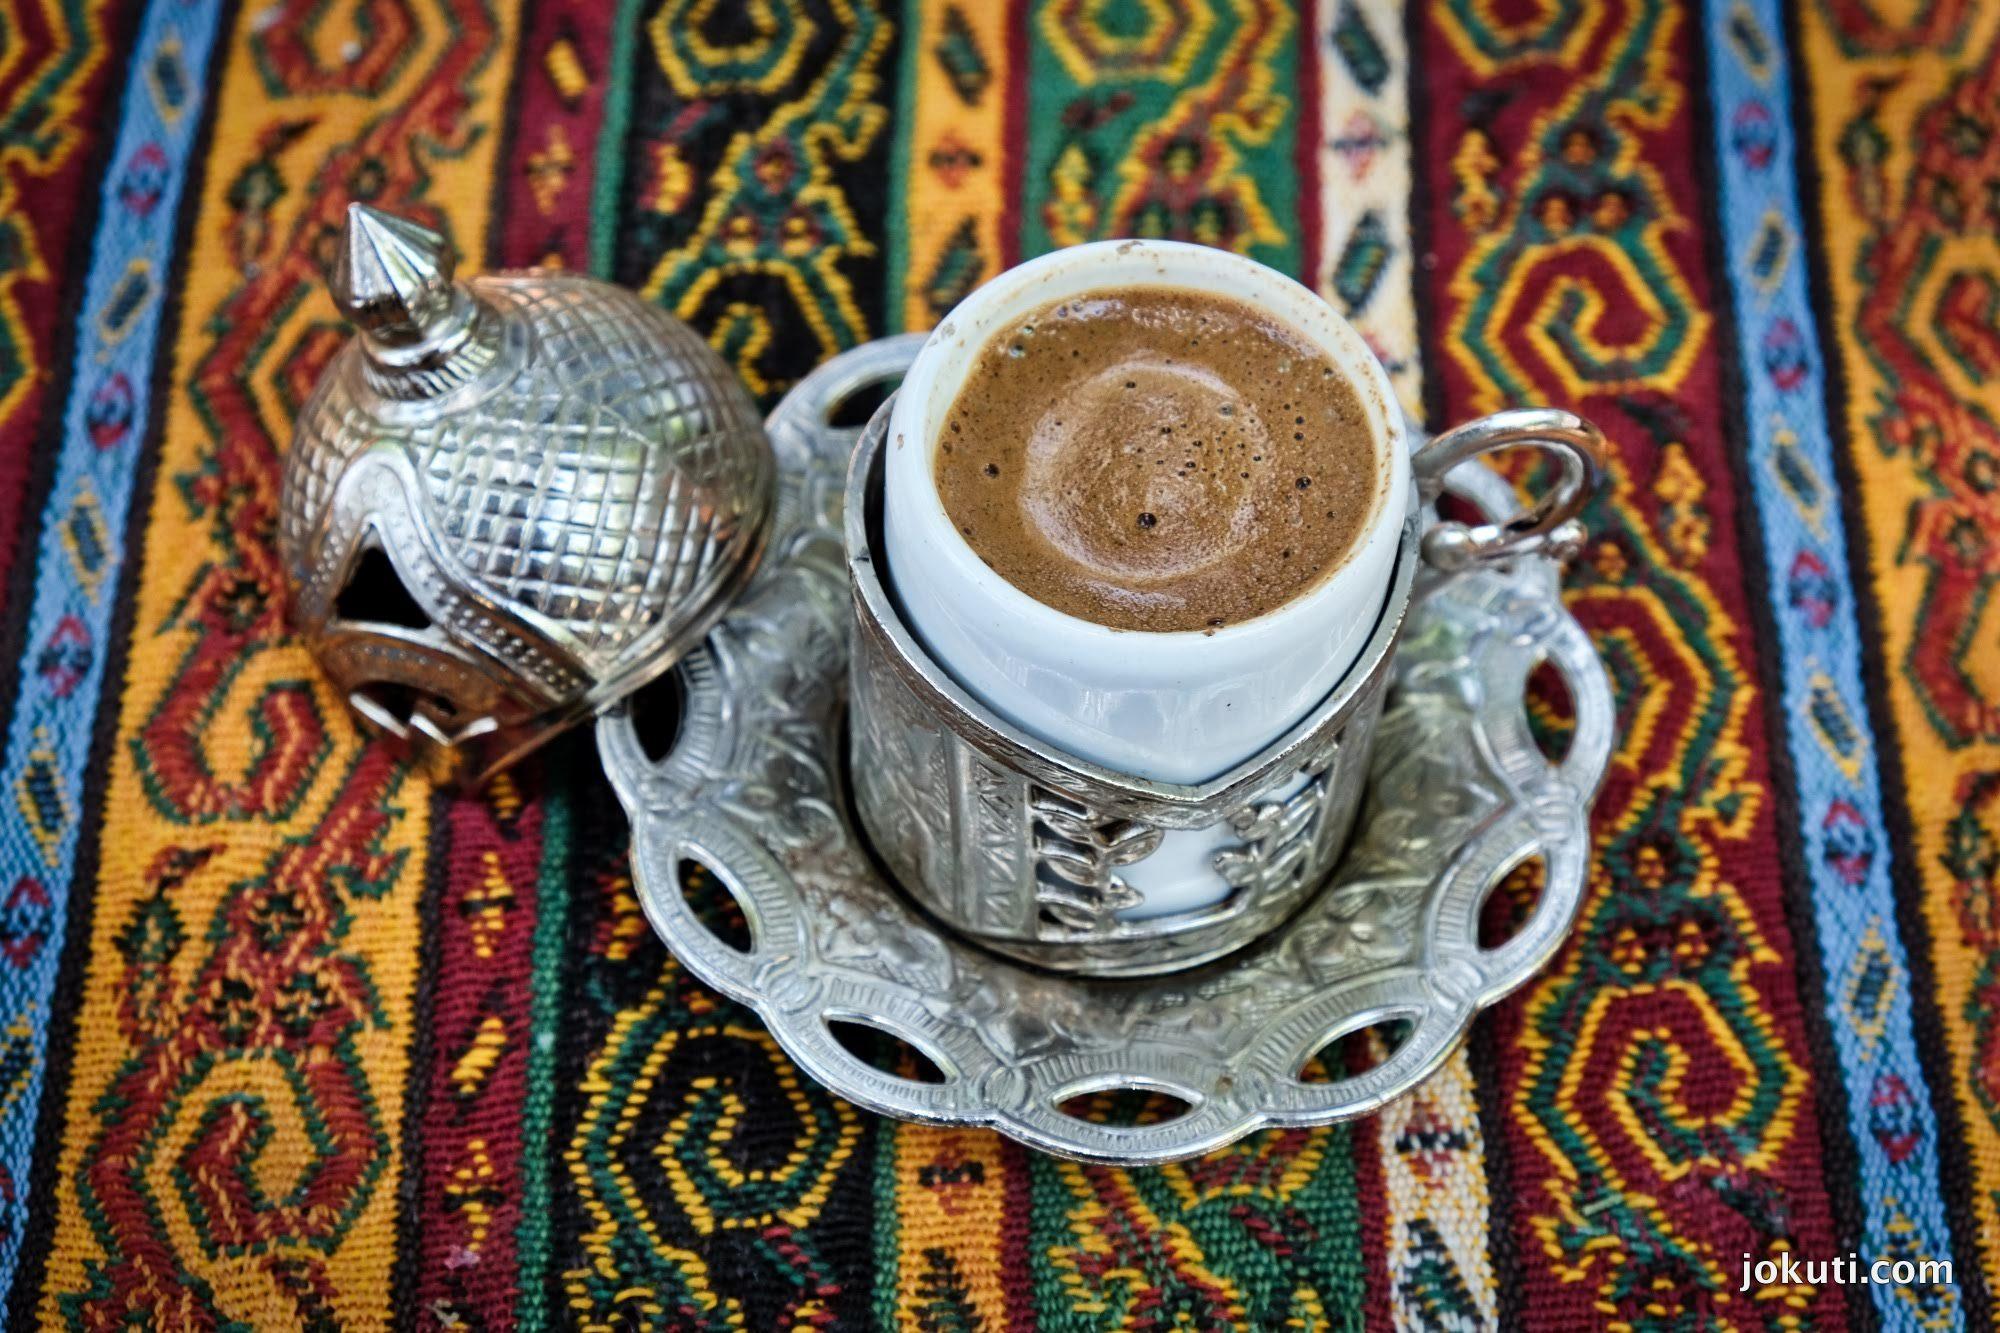 dscf5921_turkey_anatolia_mesopotamia_jokuti_vilagevo_l.jpg